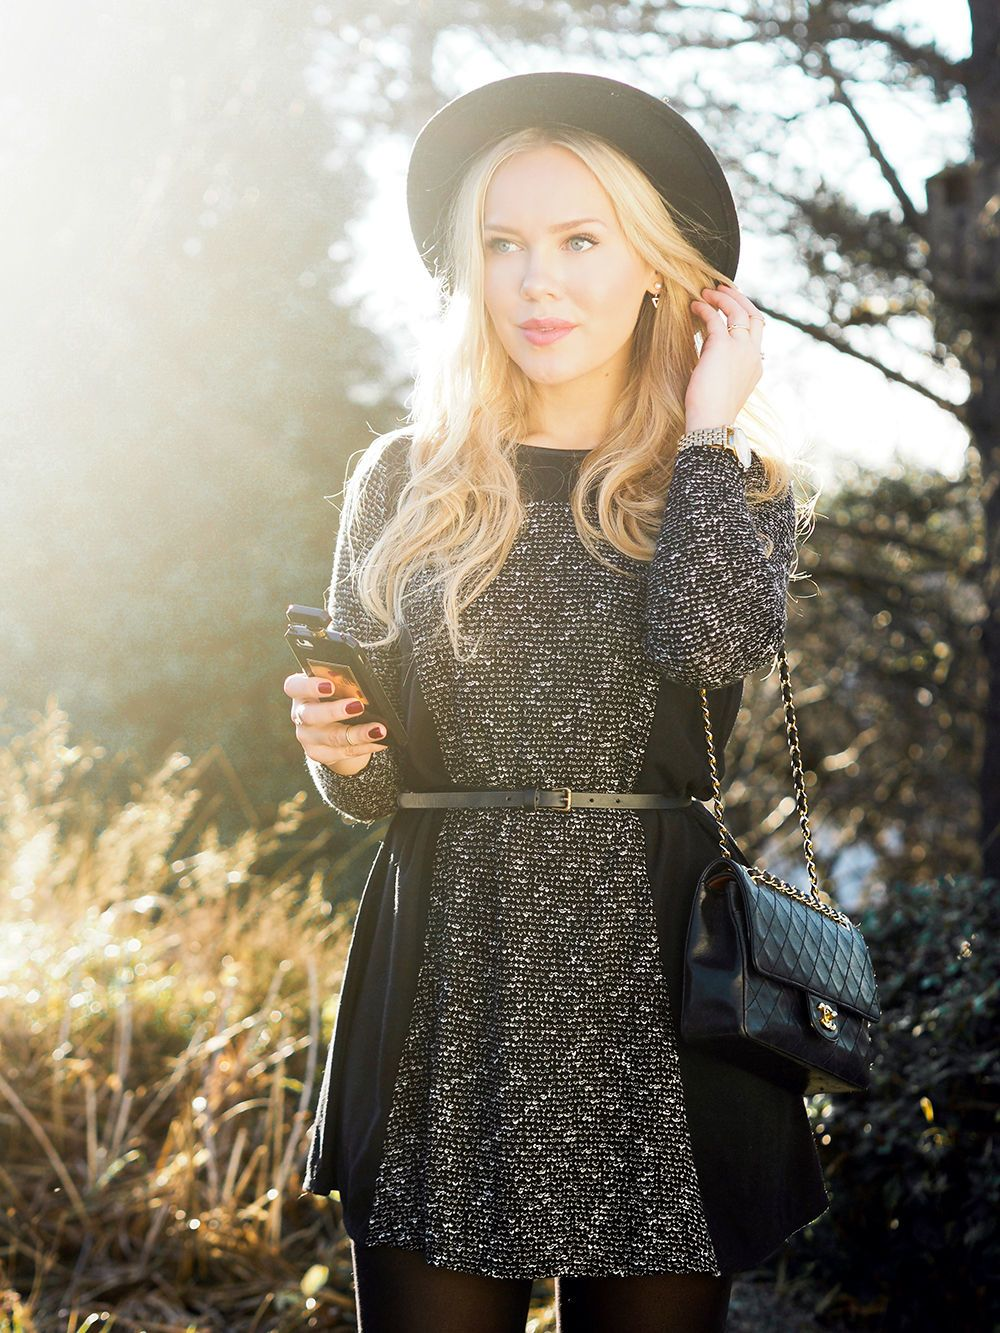 cathinthecity outfit fashion november 2014 fall blog cathrine heienberg